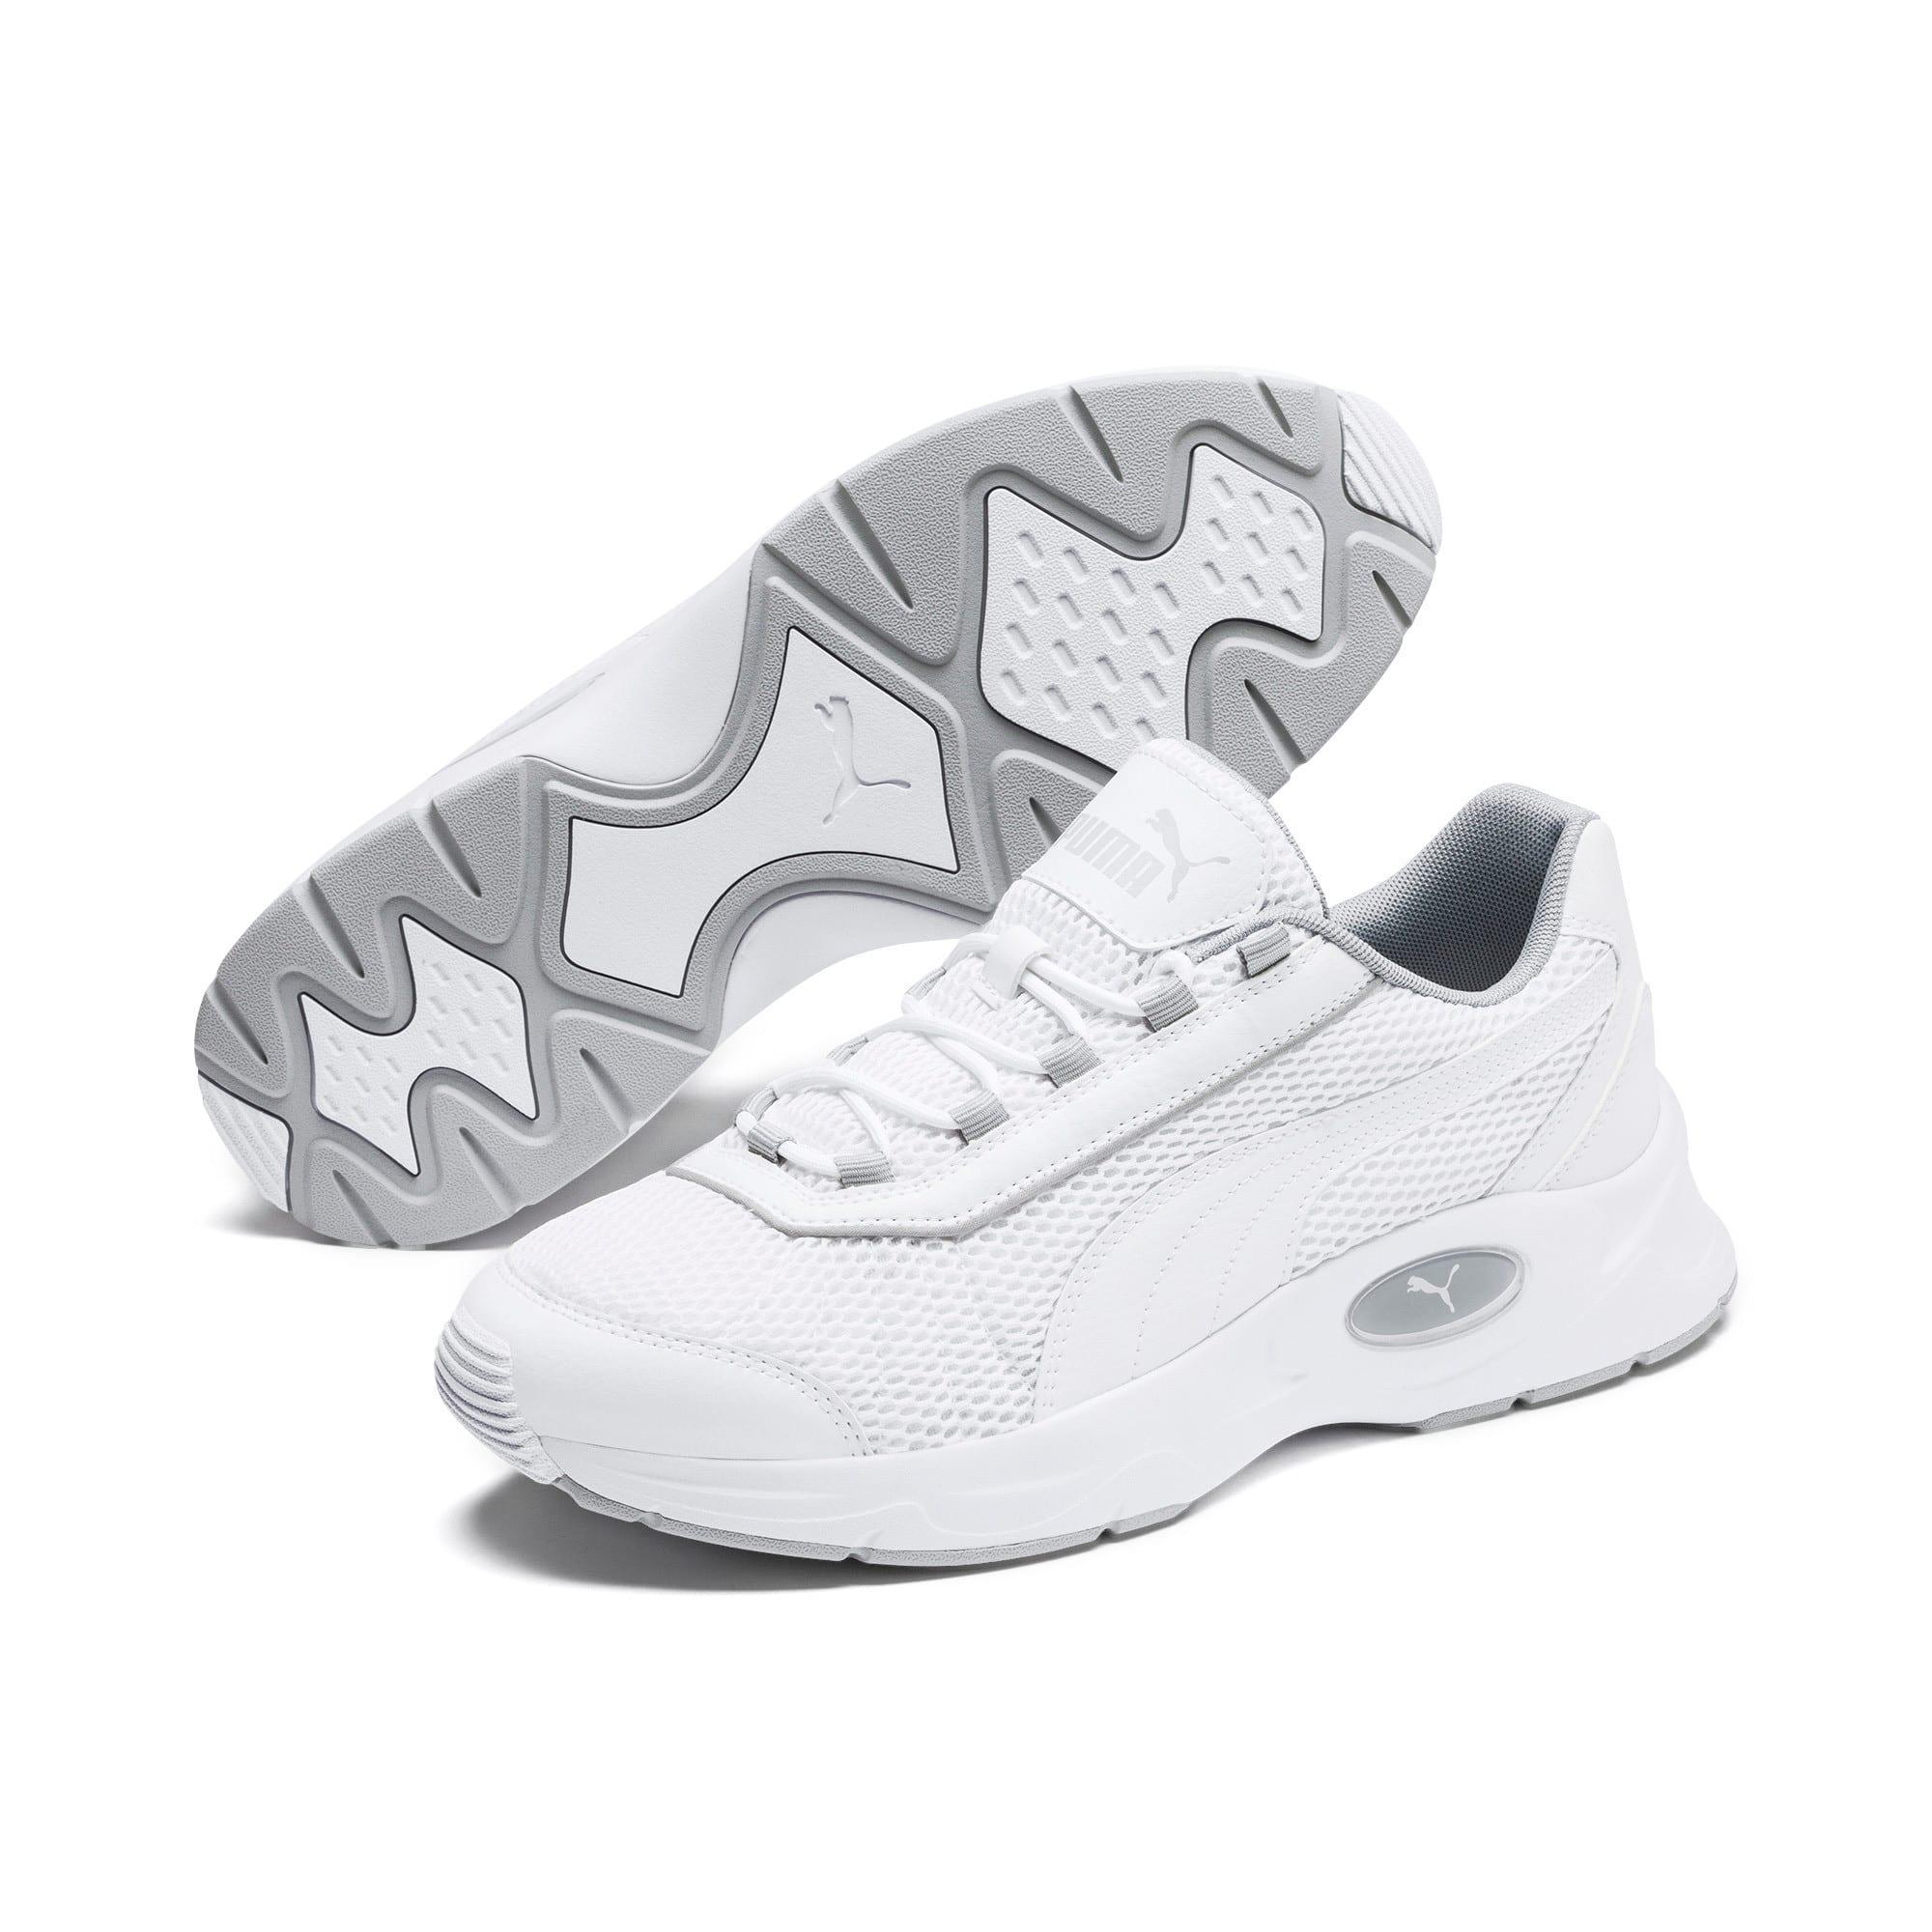 Thumbnail 3 of Nucleus Training Shoes, Puma White-High Rise, medium